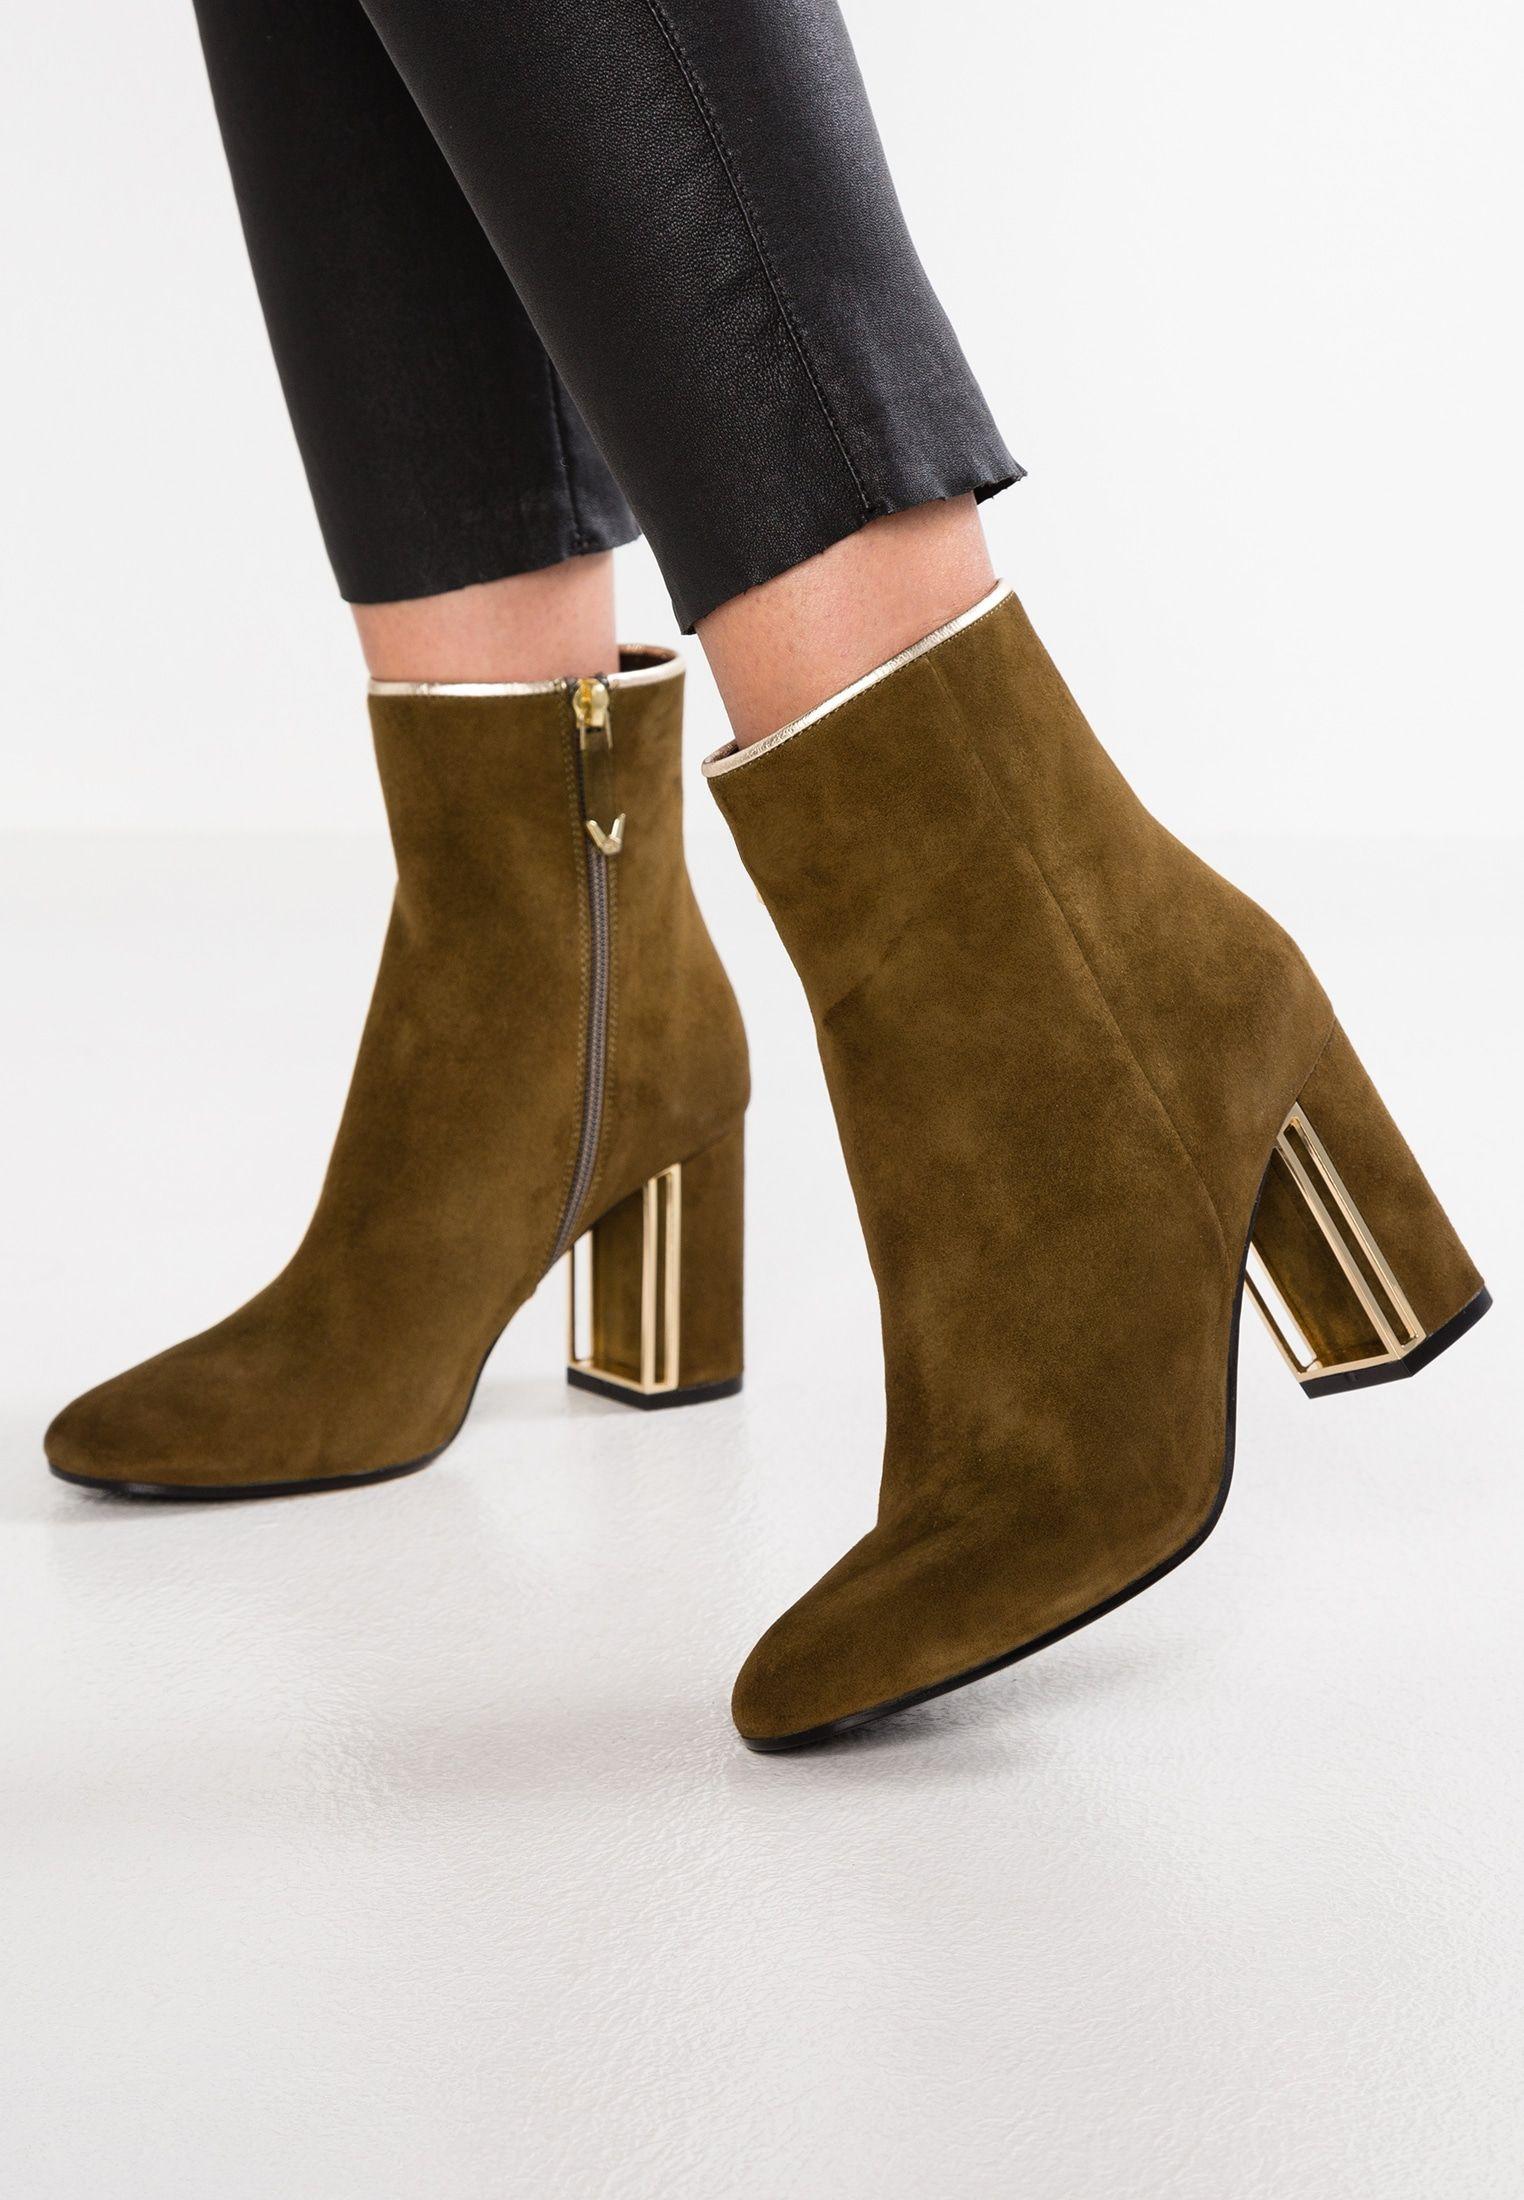 design innovativo a7b11 73e94 Korte laarzen - muschio @ Zalando.nl 🛒   my style of women ...